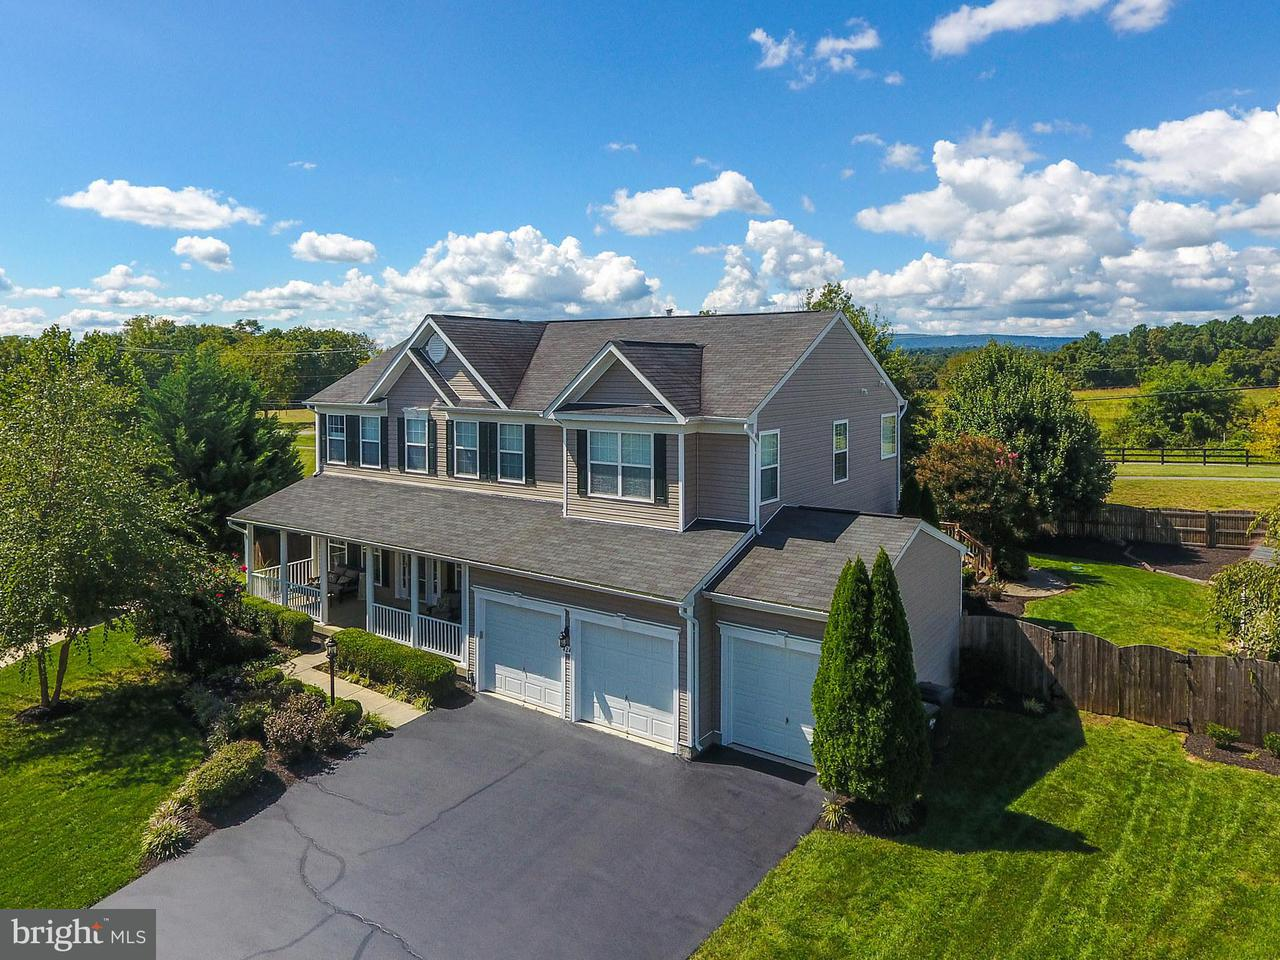 獨棟家庭住宅 為 出售 在 424 Falls Chapel Court 424 Falls Chapel Court Purcellville, 弗吉尼亞州 20132 美國